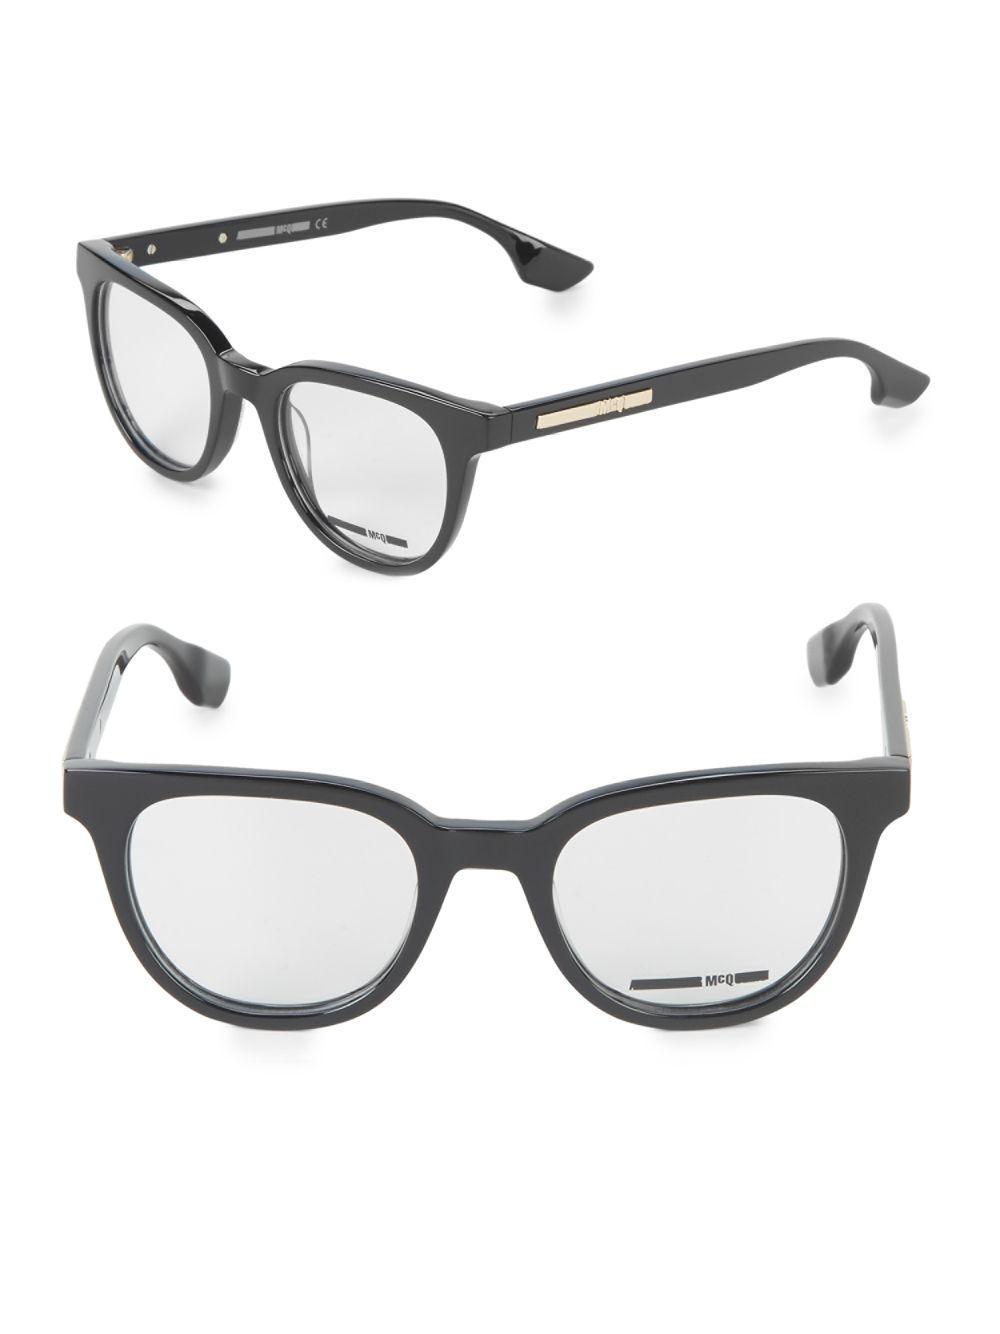 Lyst - Mcq Alexander Mcqueen 21mm Logo Optical Frames in Black